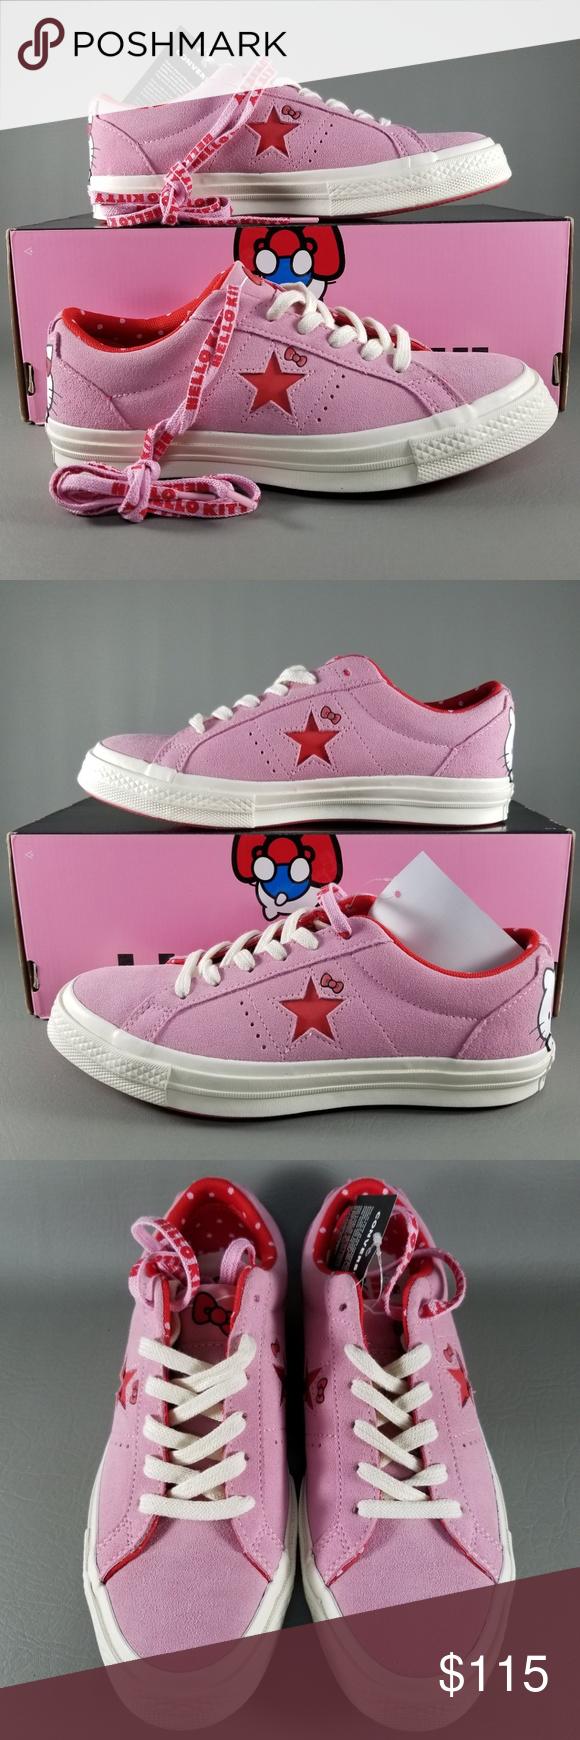 2537852339dd83 Converse X Hello Kitty One Star Ox Women Shoes 7.5 Converse X Hello Kitty One  Star